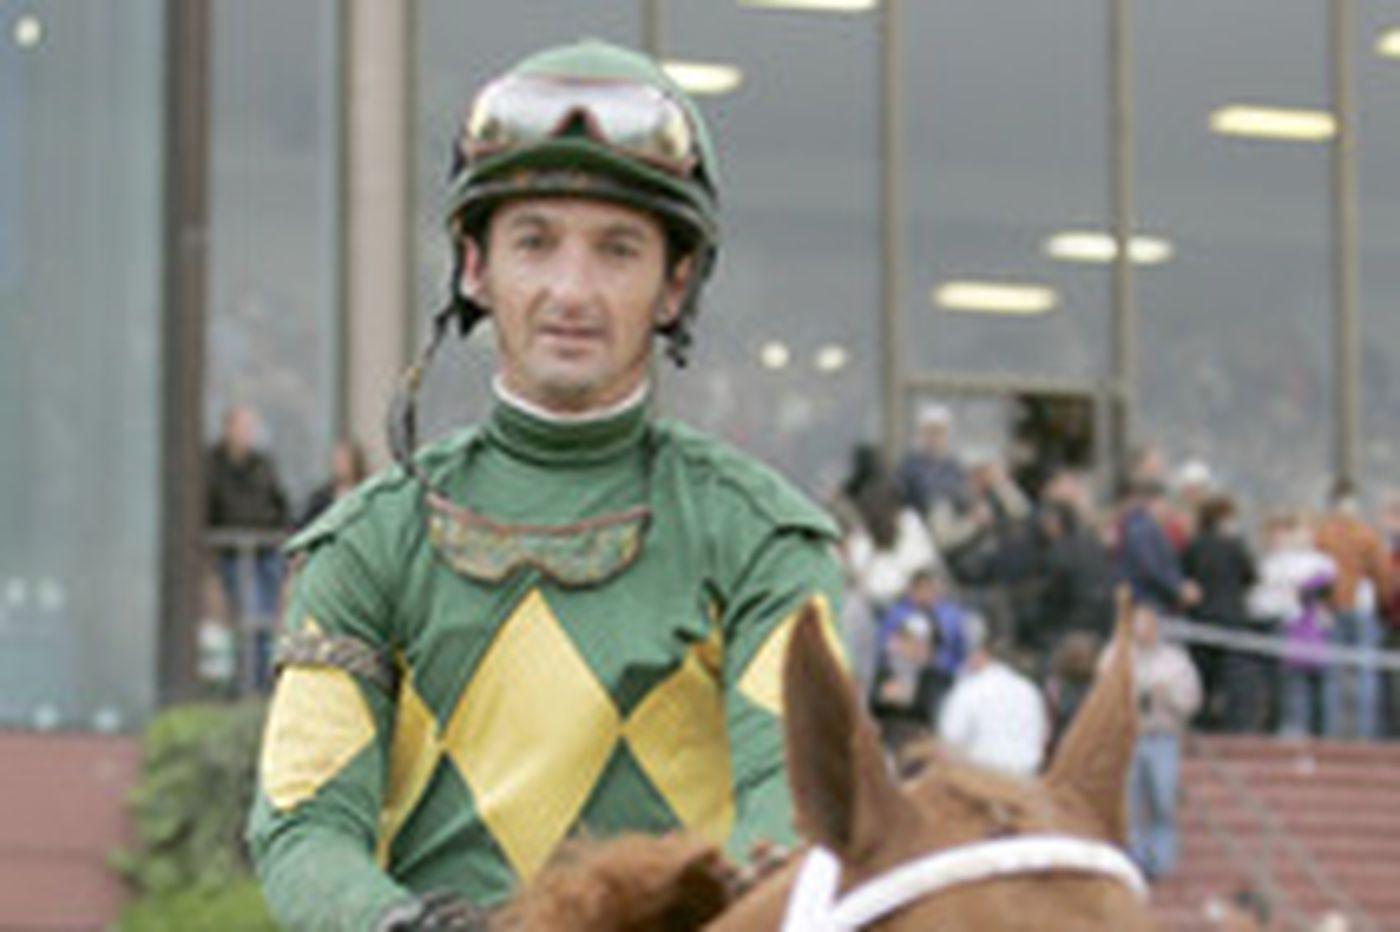 Dick Jerardi | Pa. horses among many Derby hopefuls